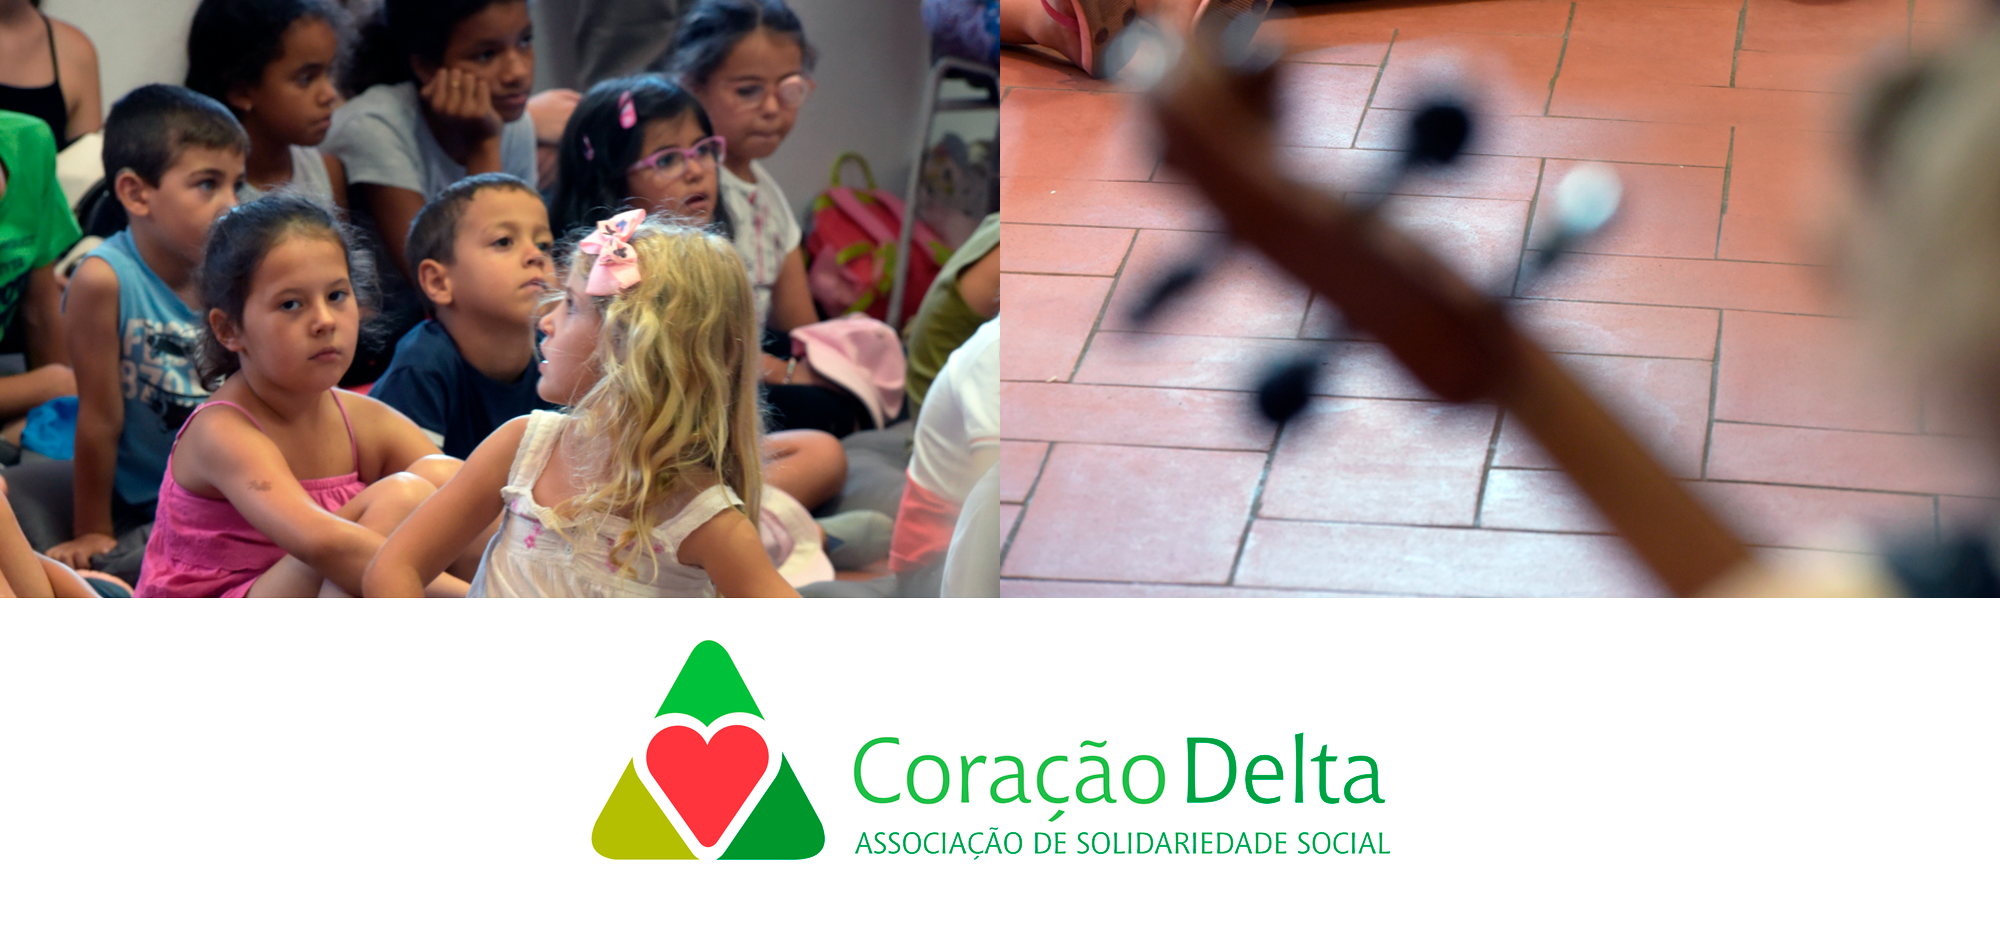 """Coração Delta"" Kids Club: new complimentary service for FIMM guests at Casa da Cultura – Marvão"